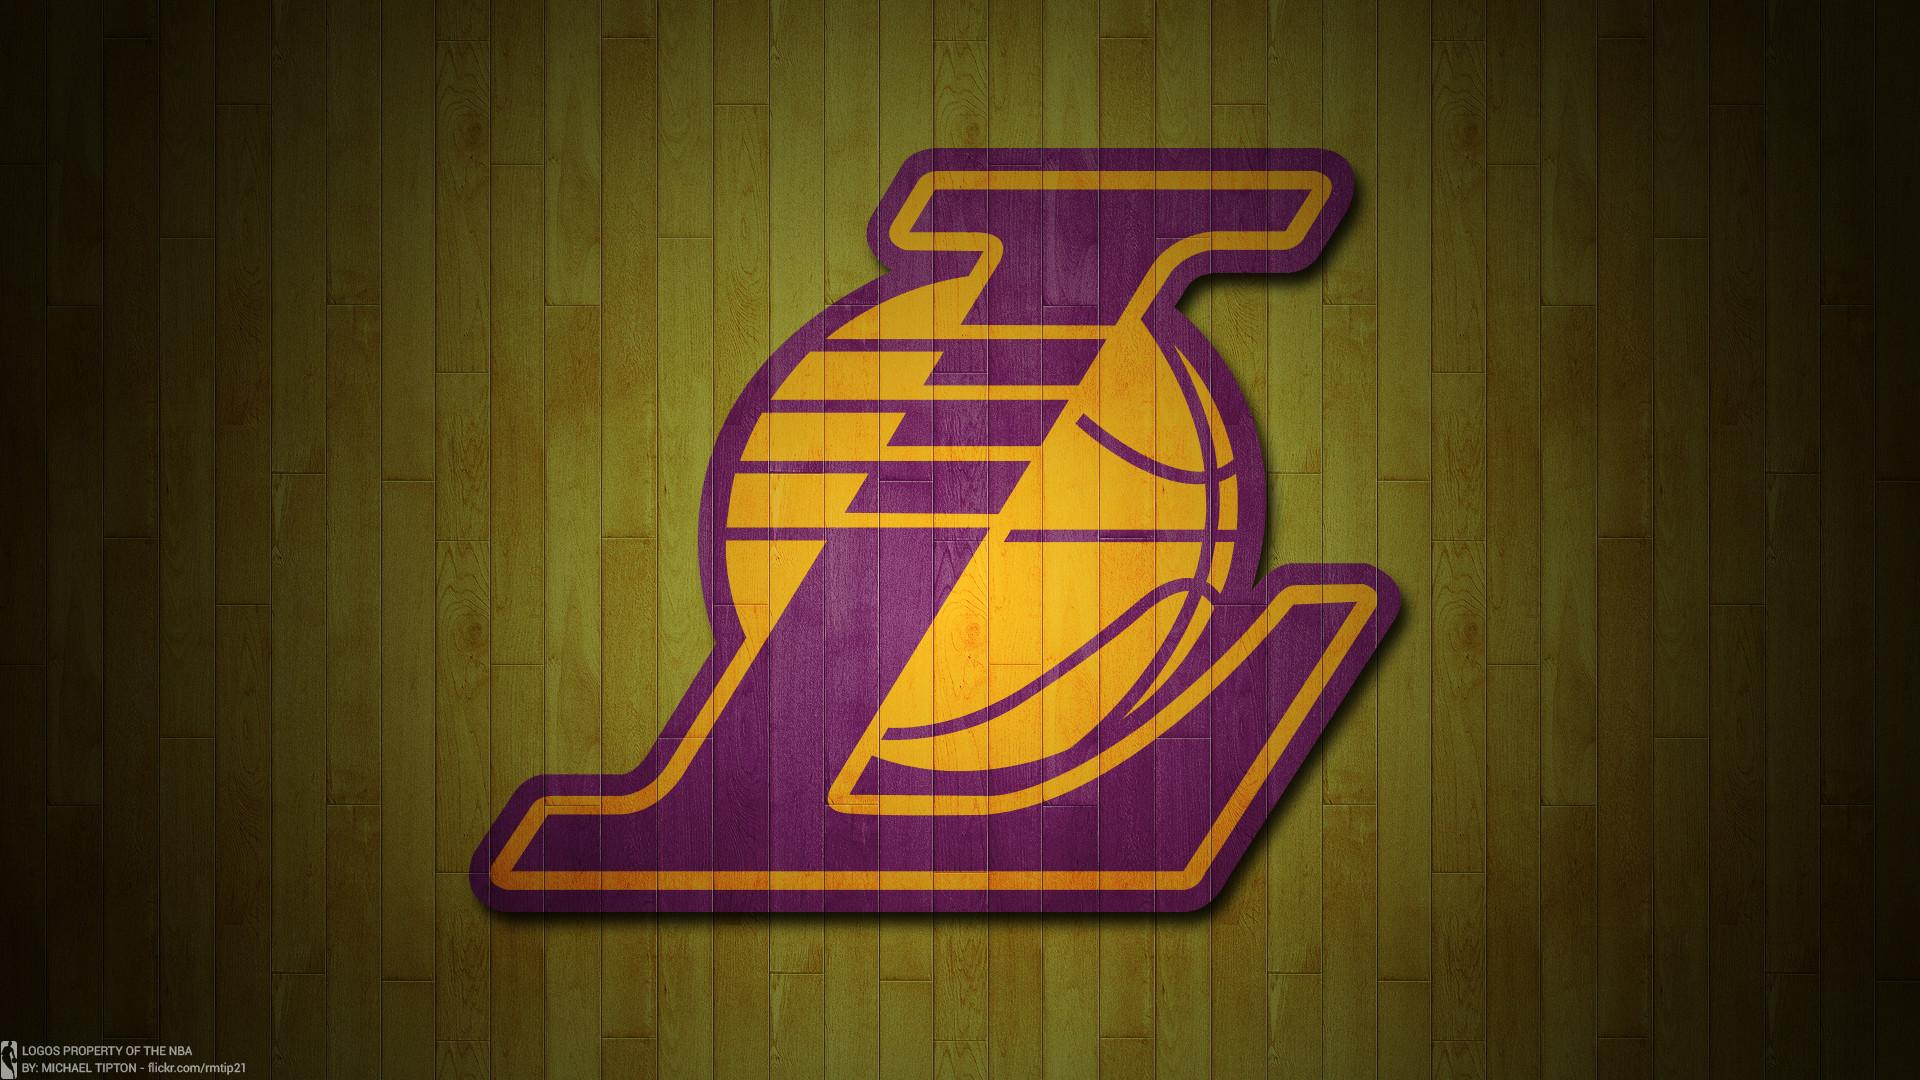 … los angeles lakers 2017 nba basketball hardwood logo wallpaper free pc  desktop computer hd